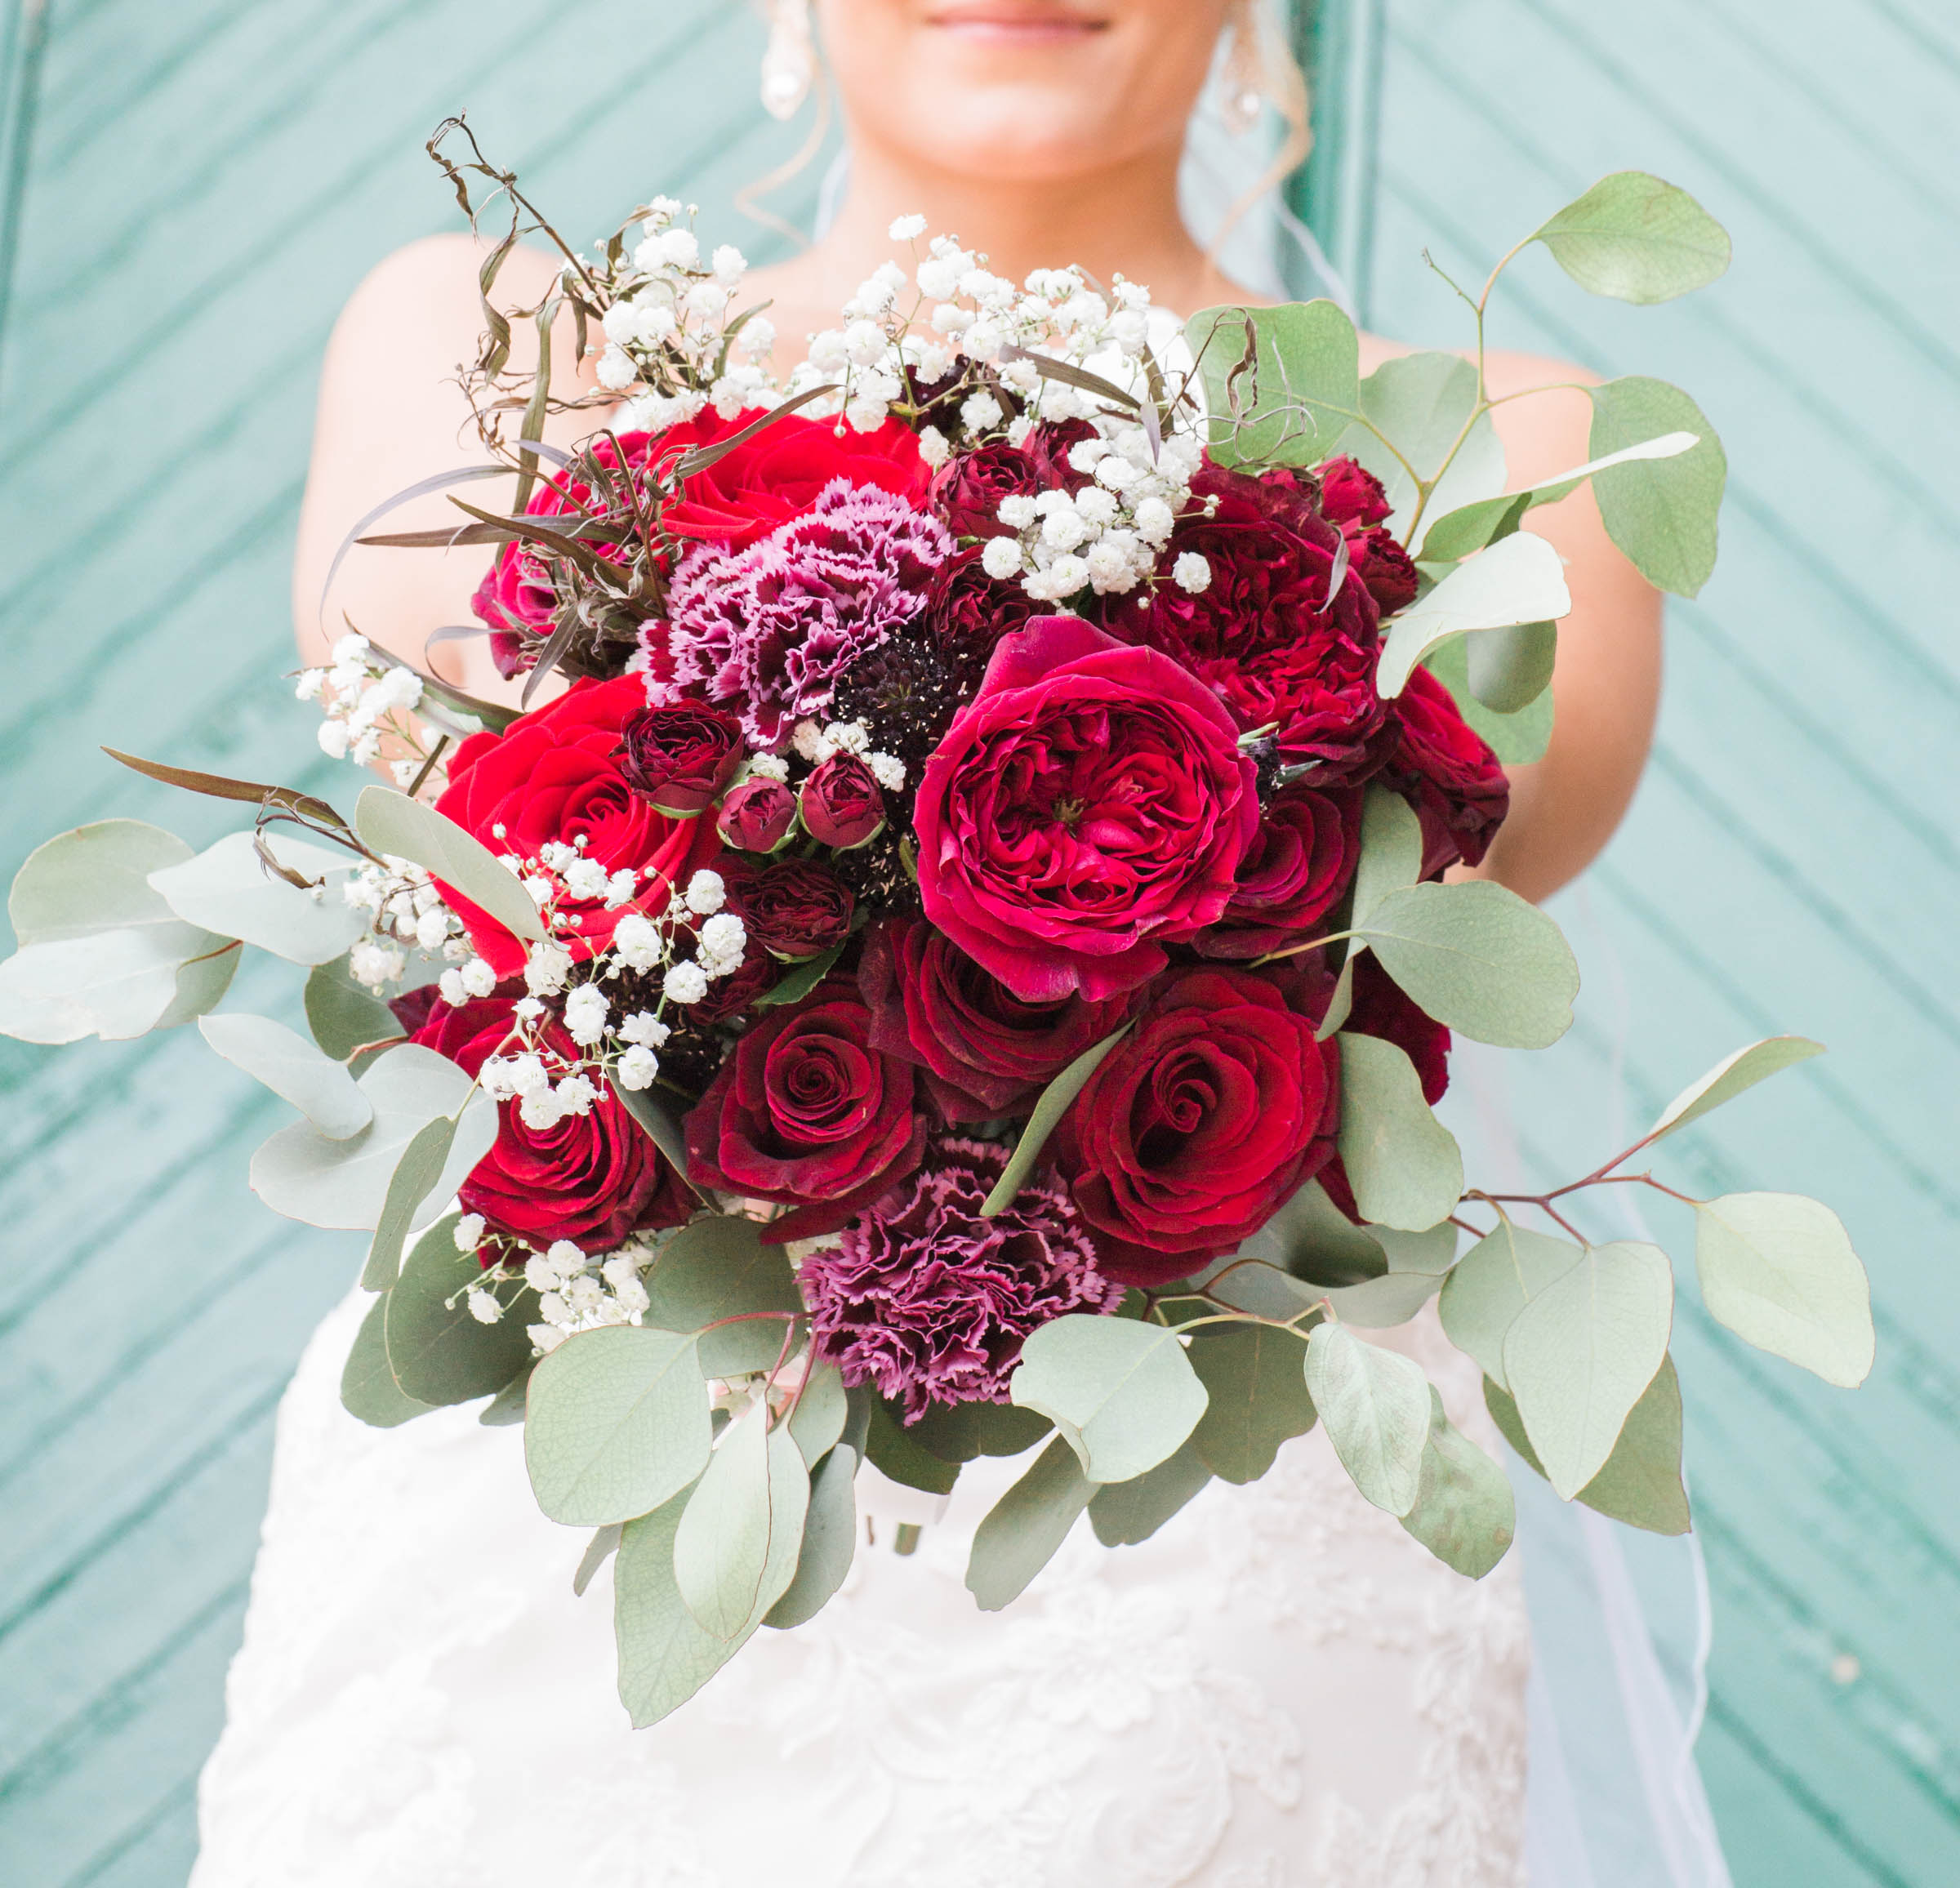 Ellicott City Wedding Photography by Megapixels Media Top Maryland Wedding Photographer bridal bouquet.jpg